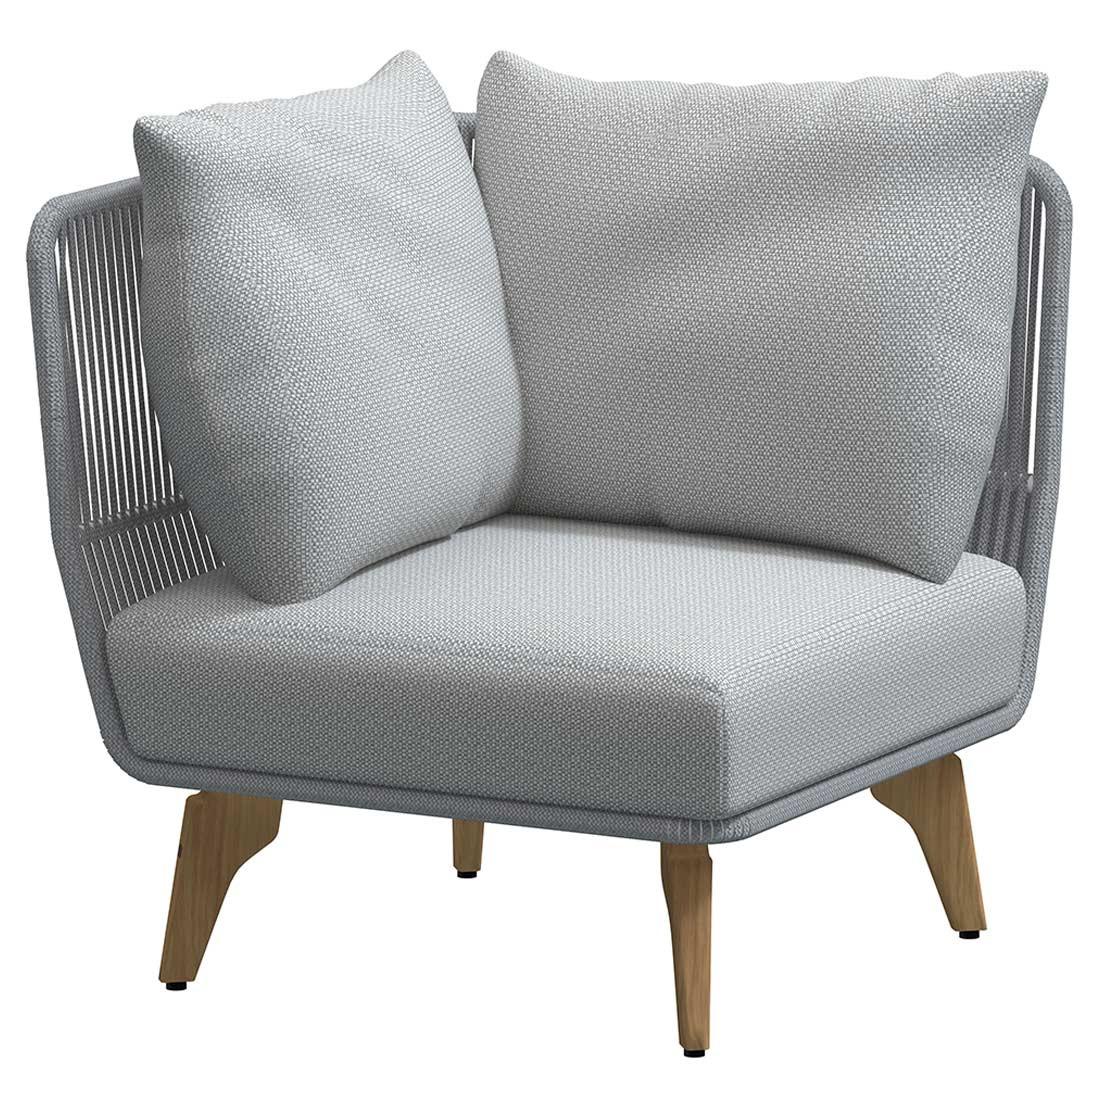 Raphael Modular Teak Frozen corner with 3 cushions